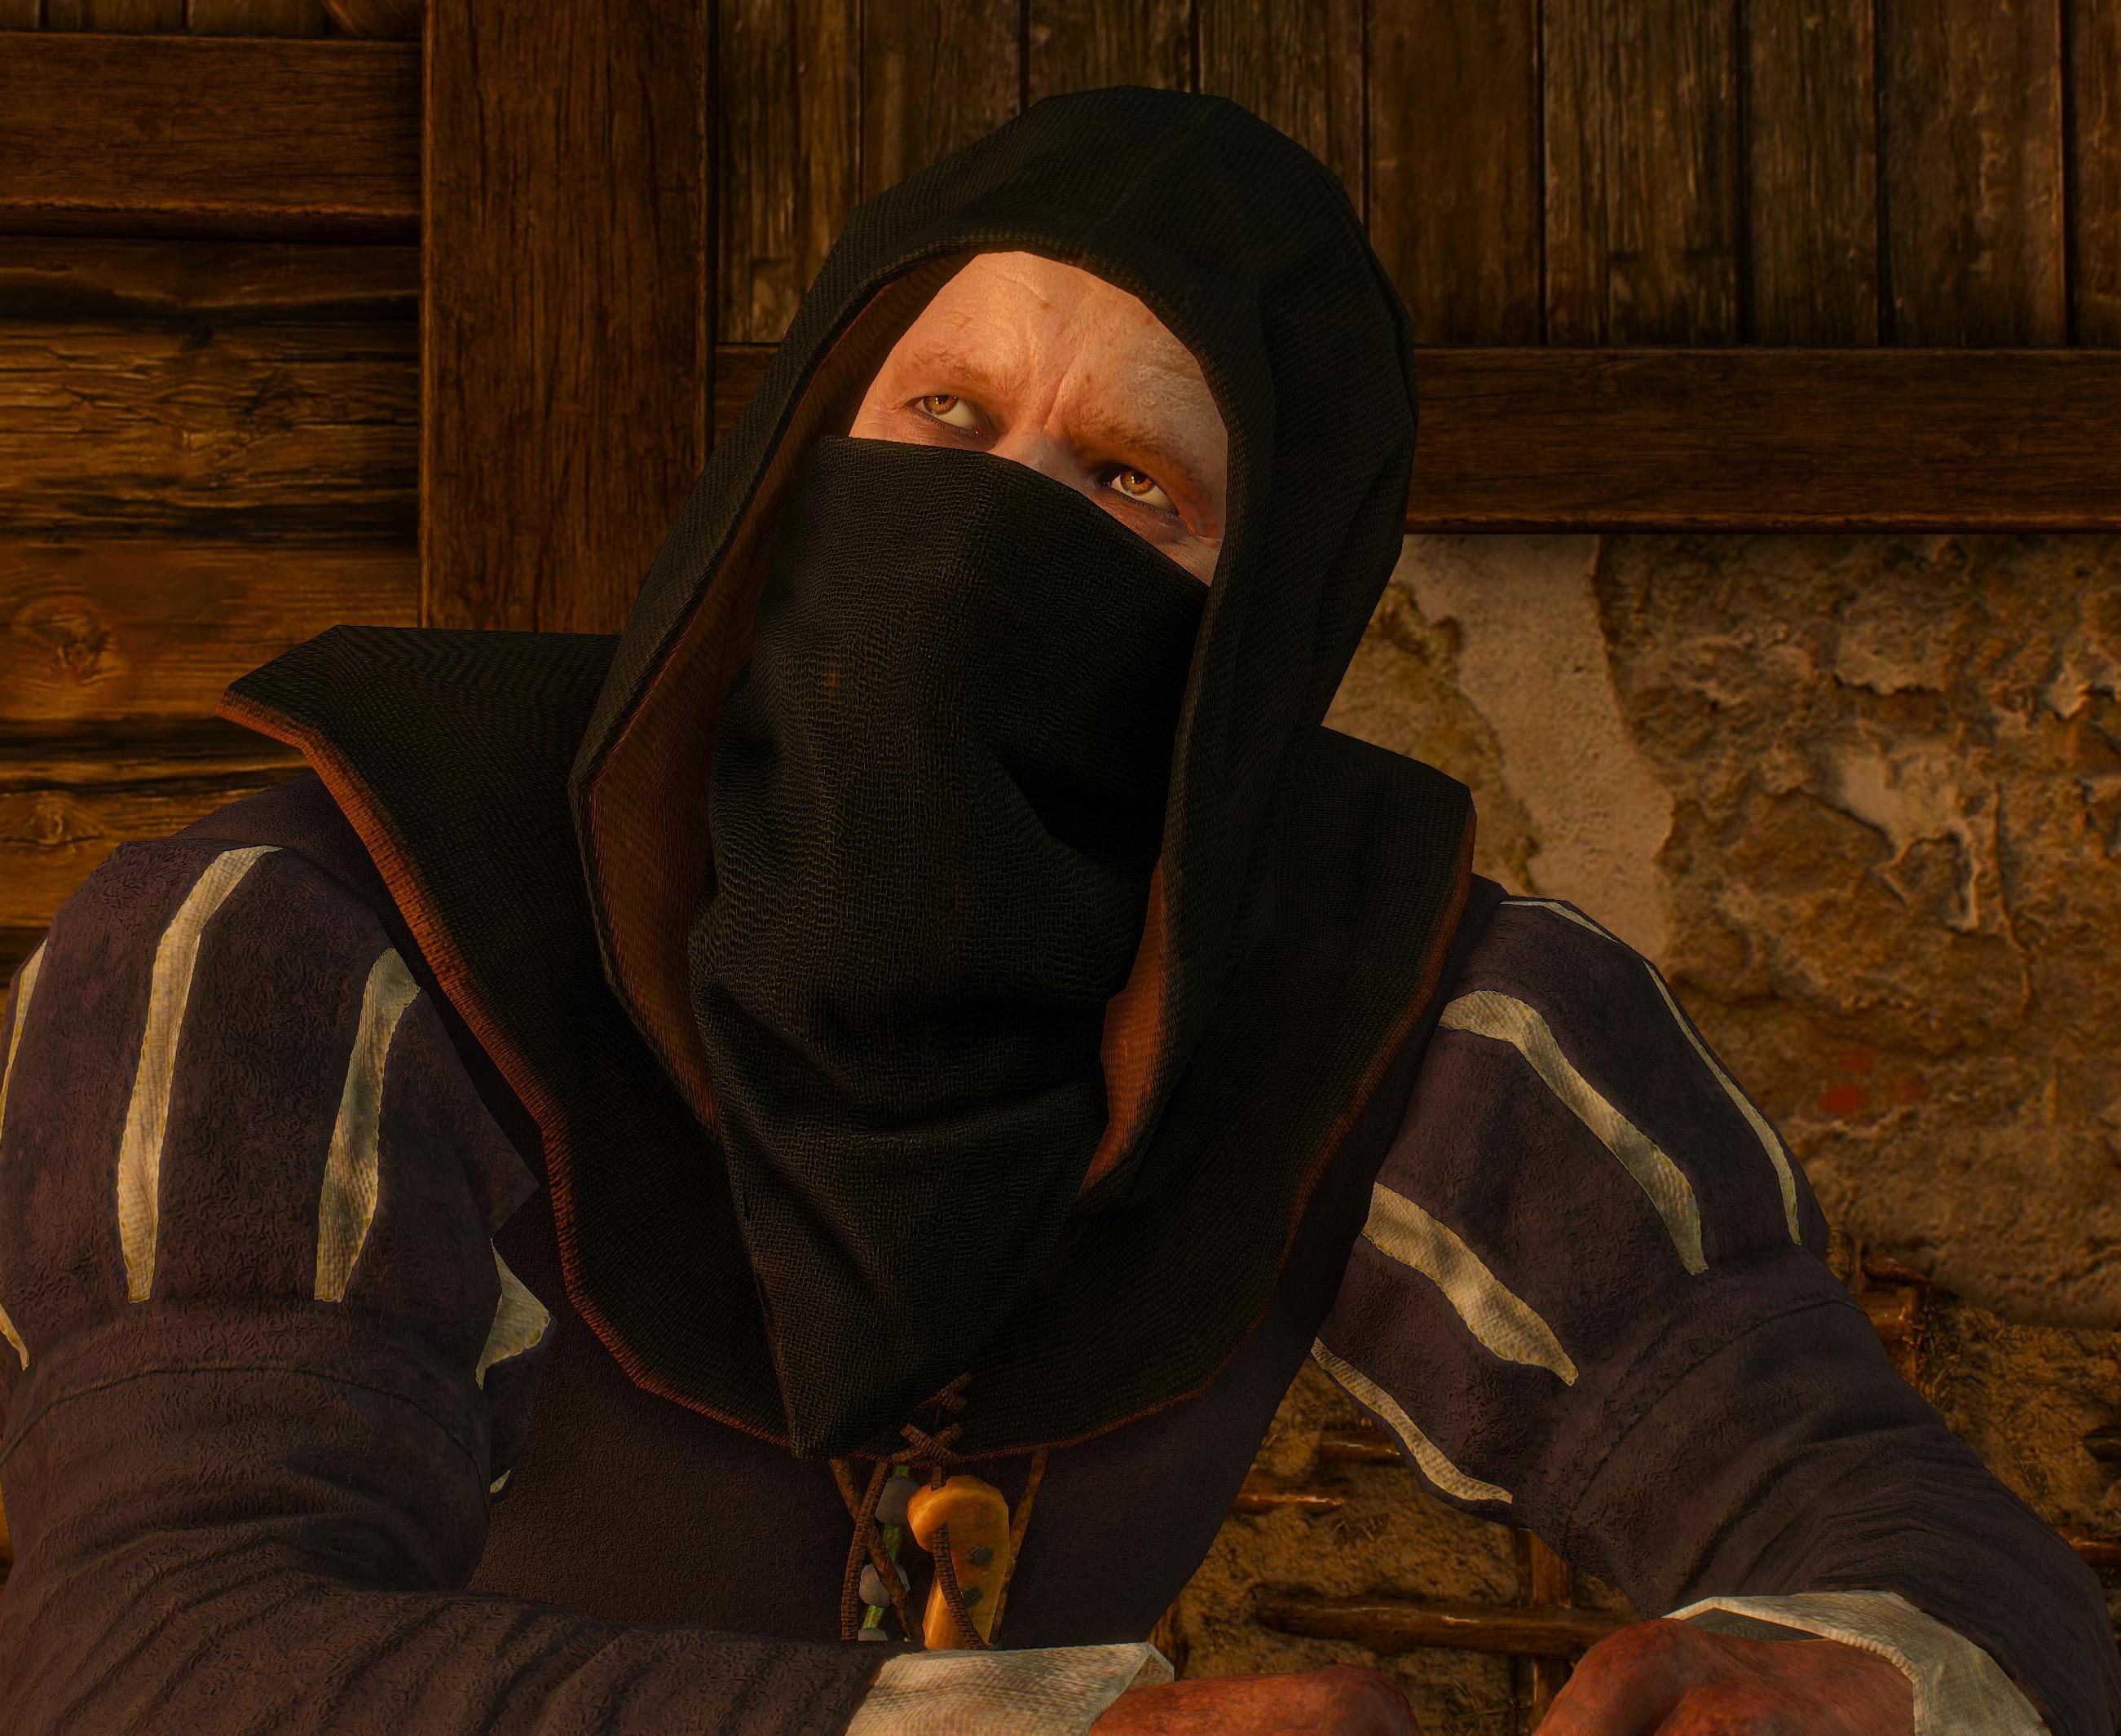 Hrabia (gangster)